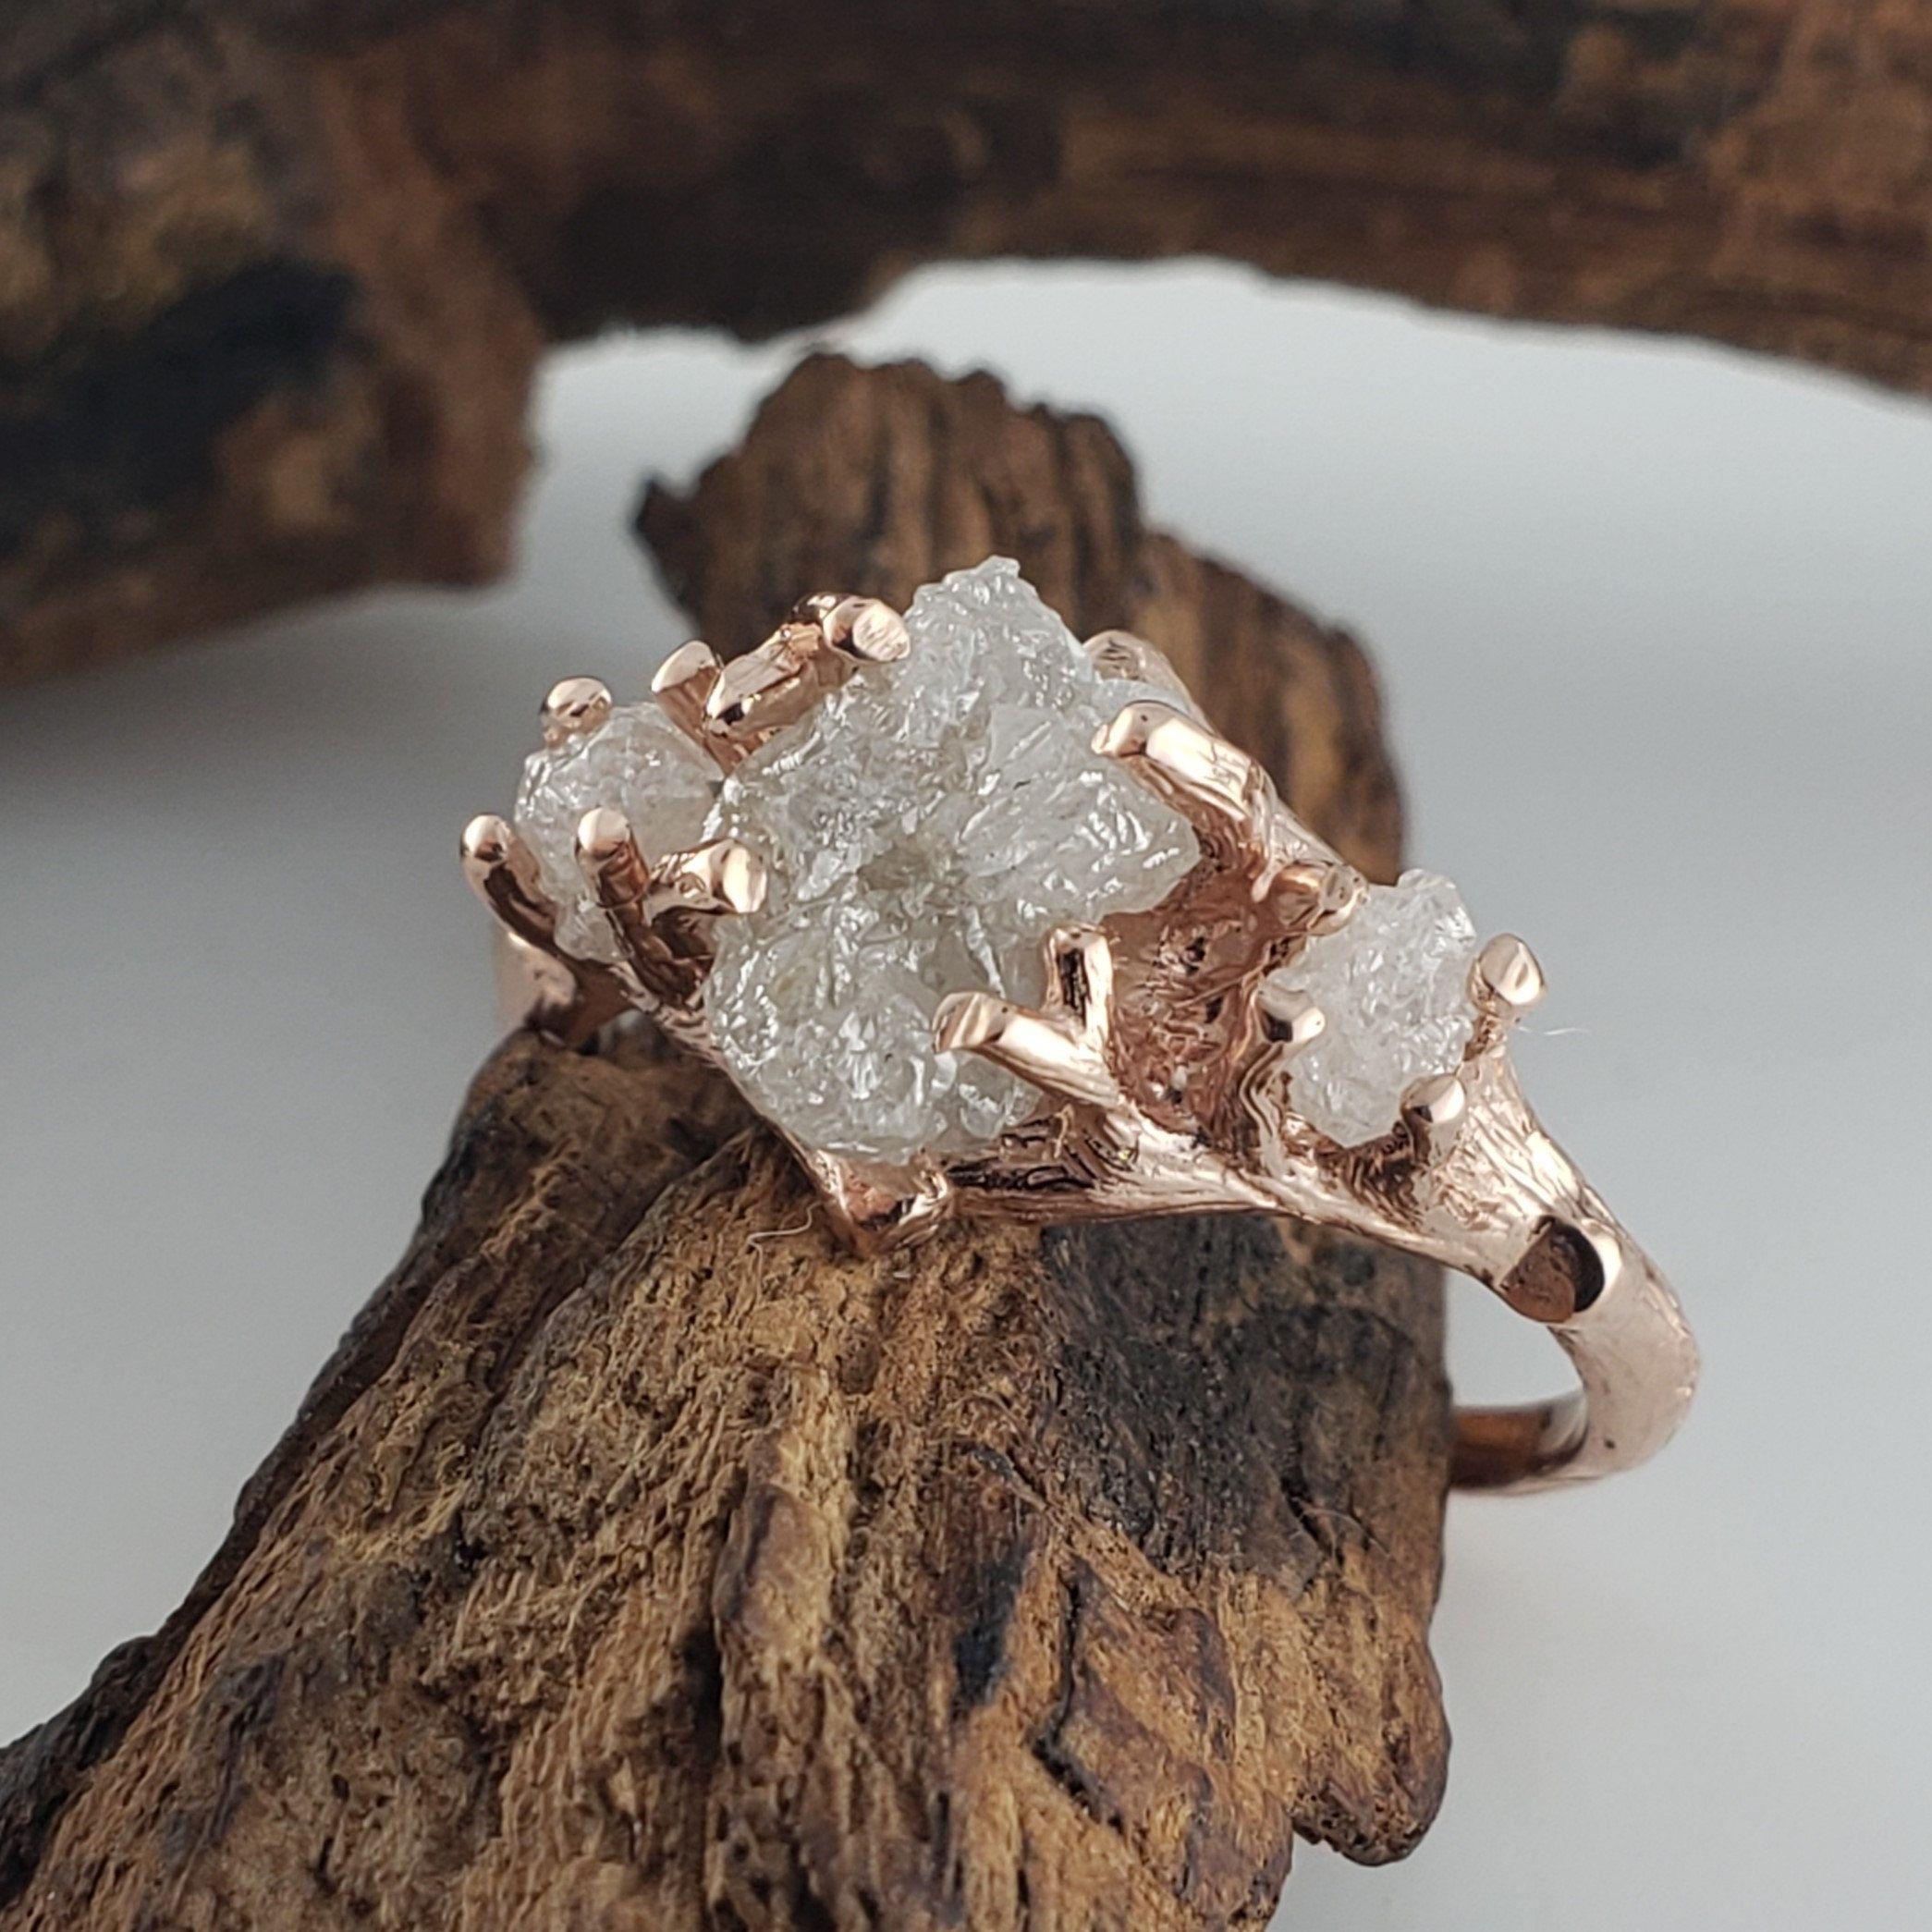 3 Rough Diamond Engagement Ring Twig Engagement Ring Diamond Wedding Ring Ro Rough Diamond Engagement Ring Unique Engagement Rings Dream Engagement Rings